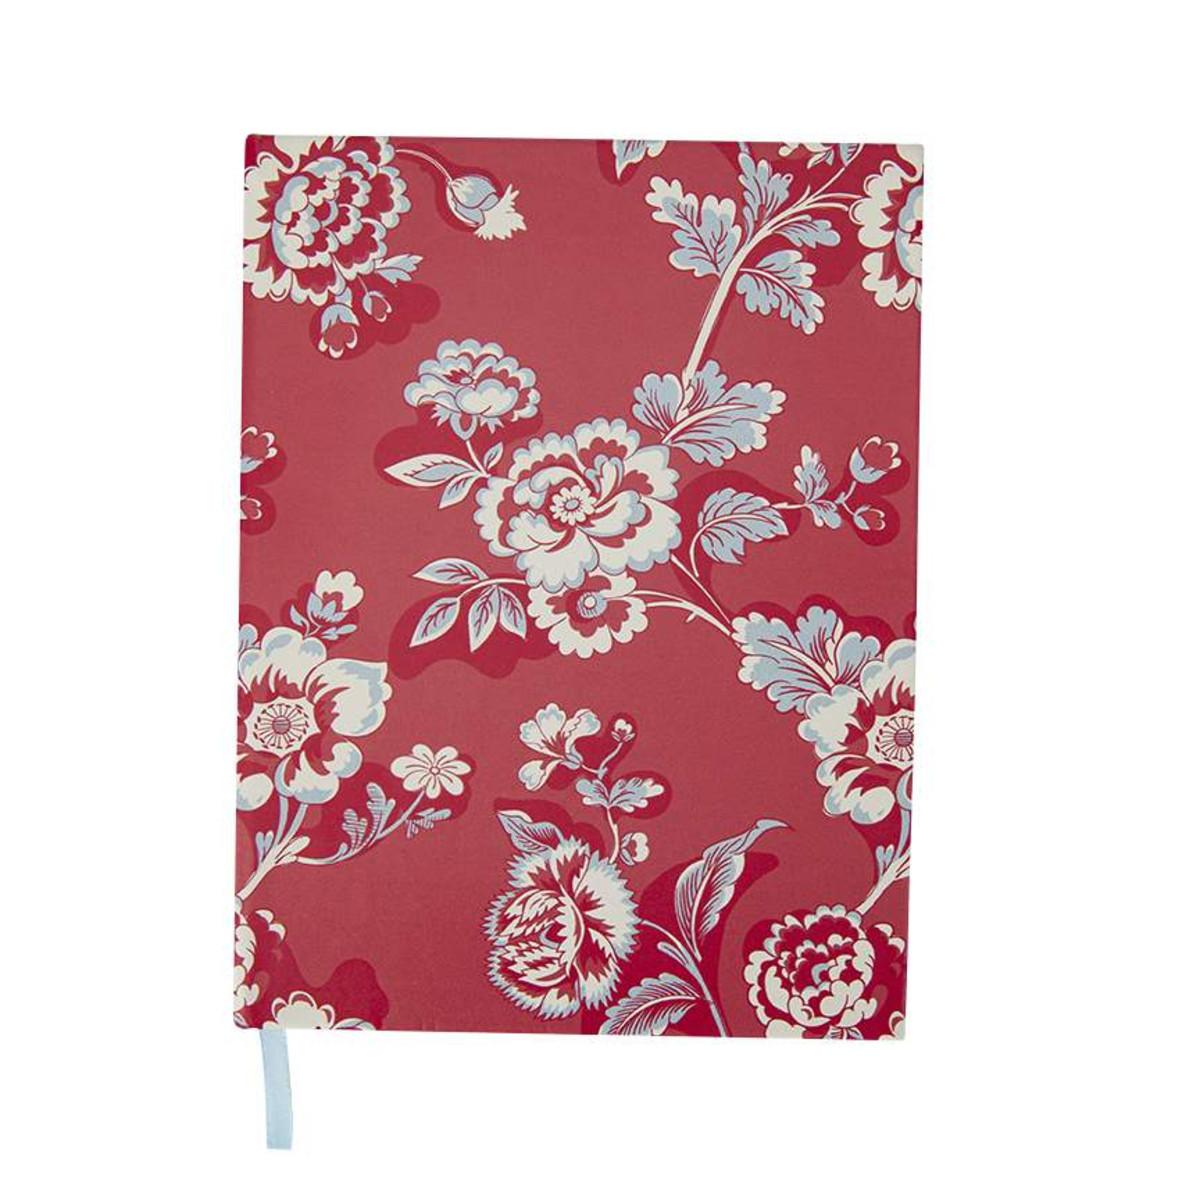 Riley Blake Jane Austen Journal - Lady Catherine